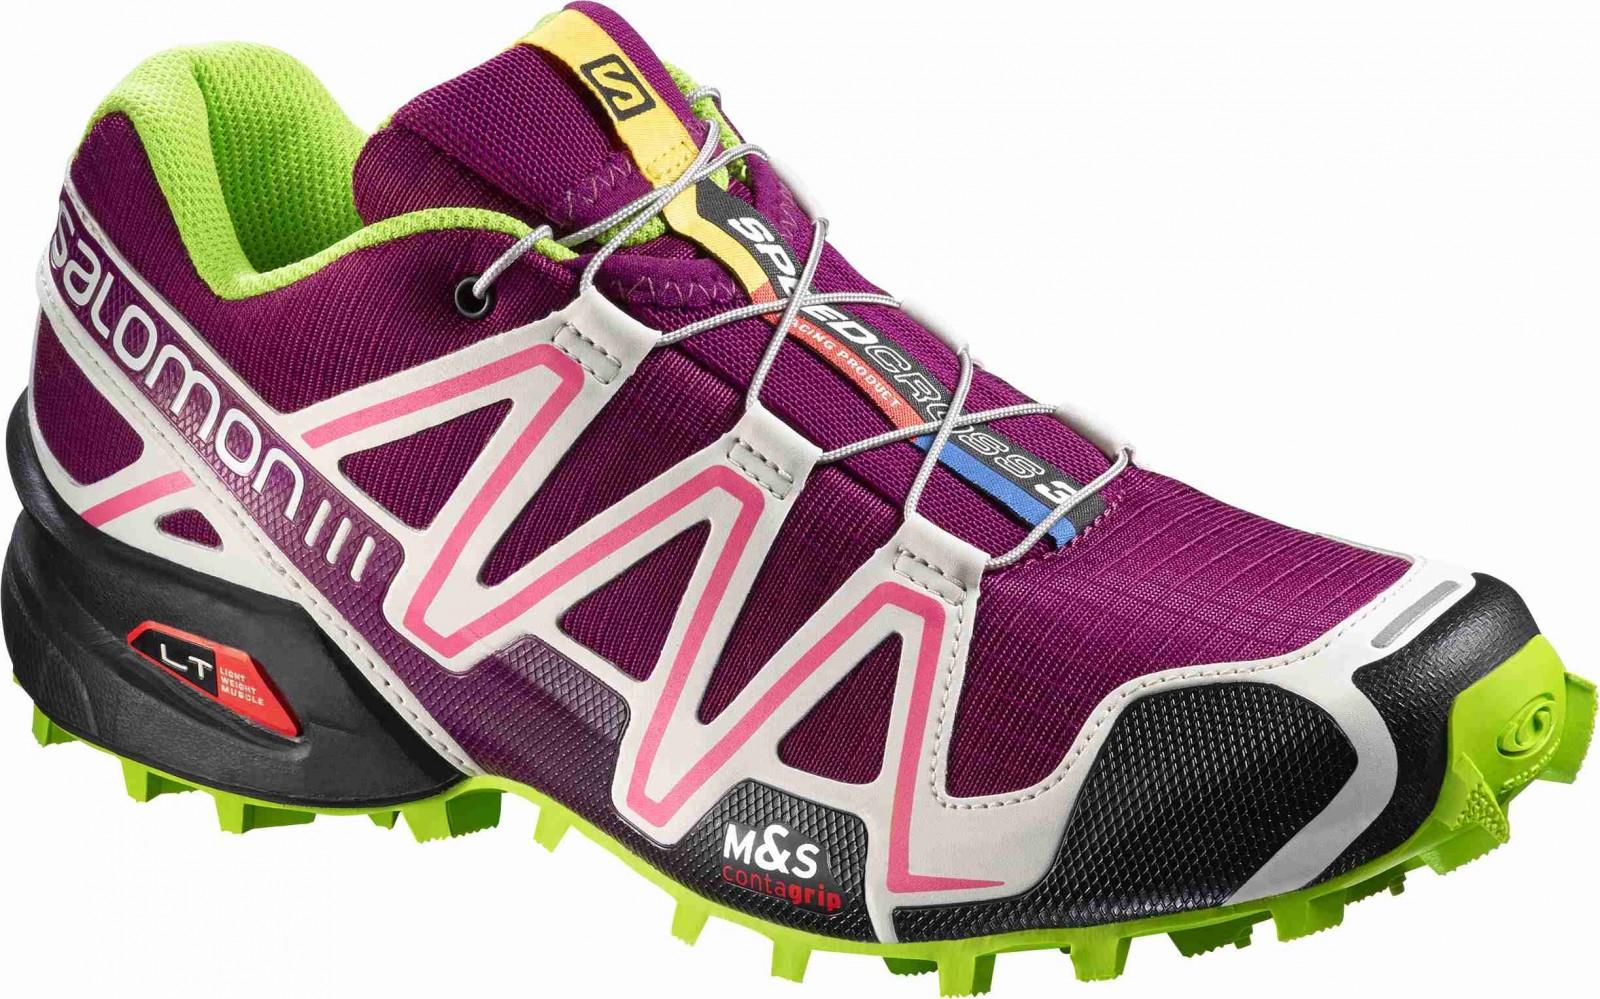 Dámské běžecké boty Salomon SPEEDCROSS 3 W MYSTIC PURPLE G  d2275c9c5d